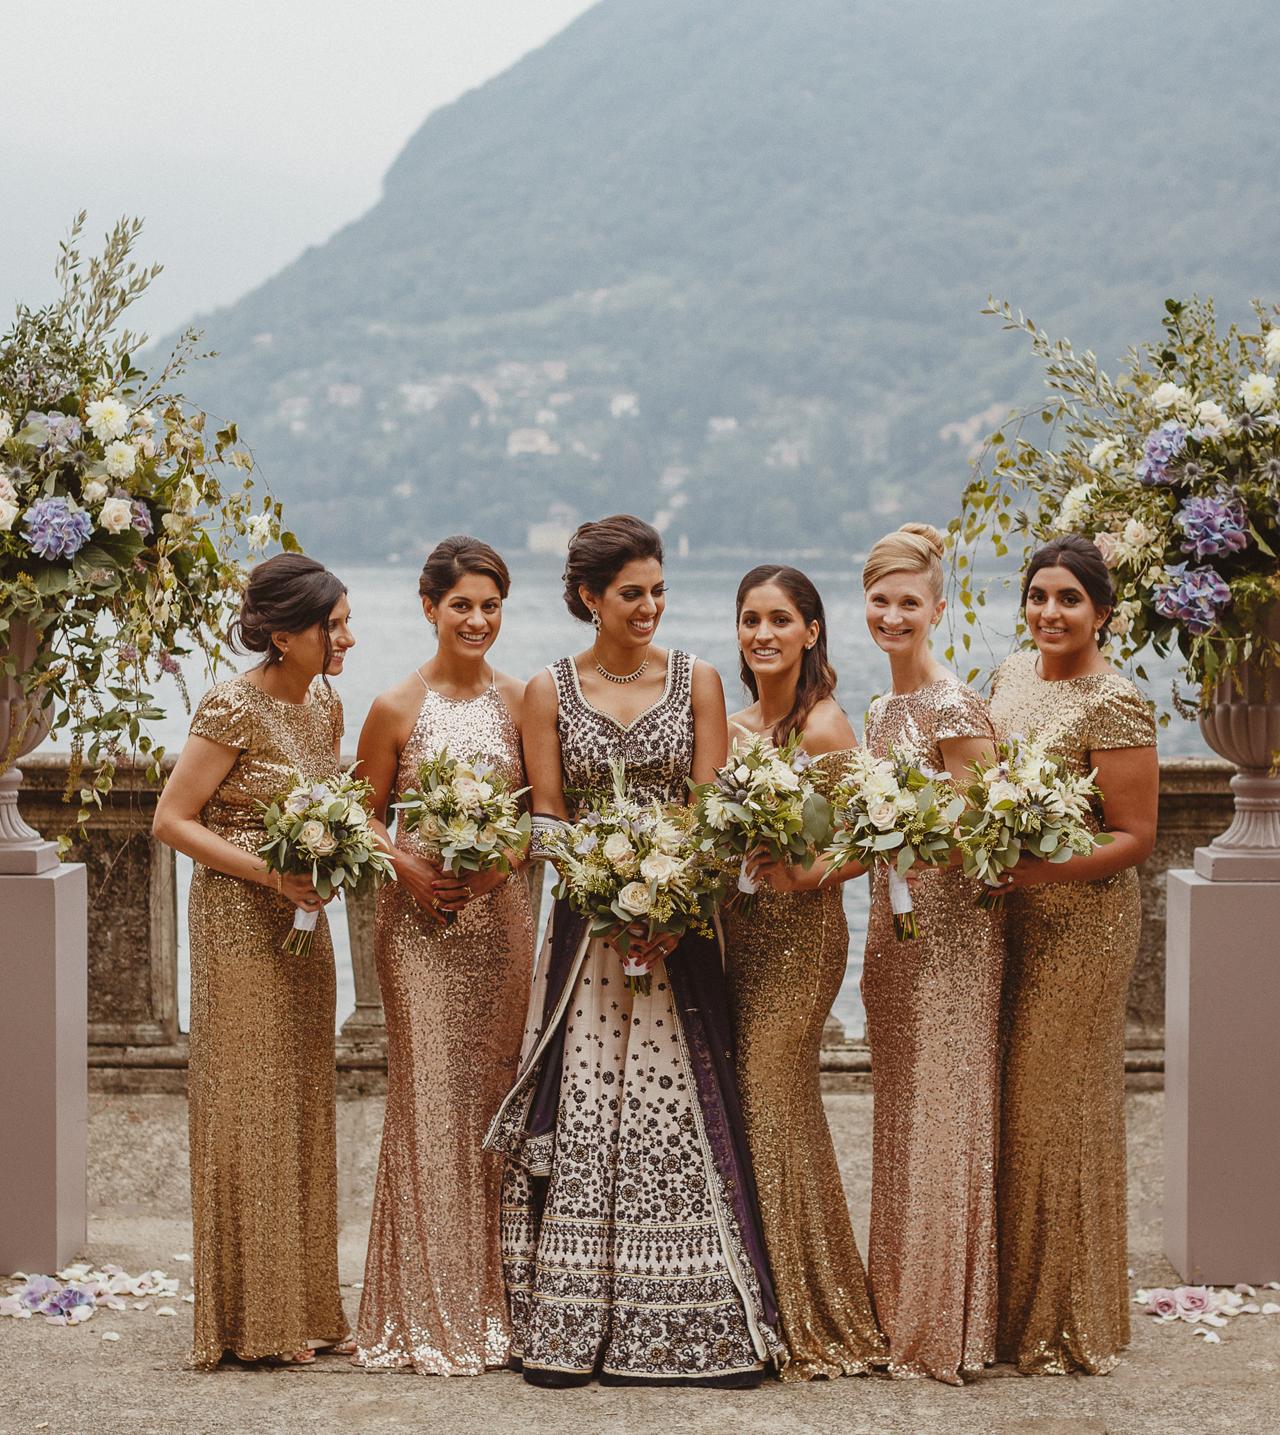 Lake-Como-Indian-wedding-at-Villa-Pizzo-by-My-Lake-Como-Wedding-blog